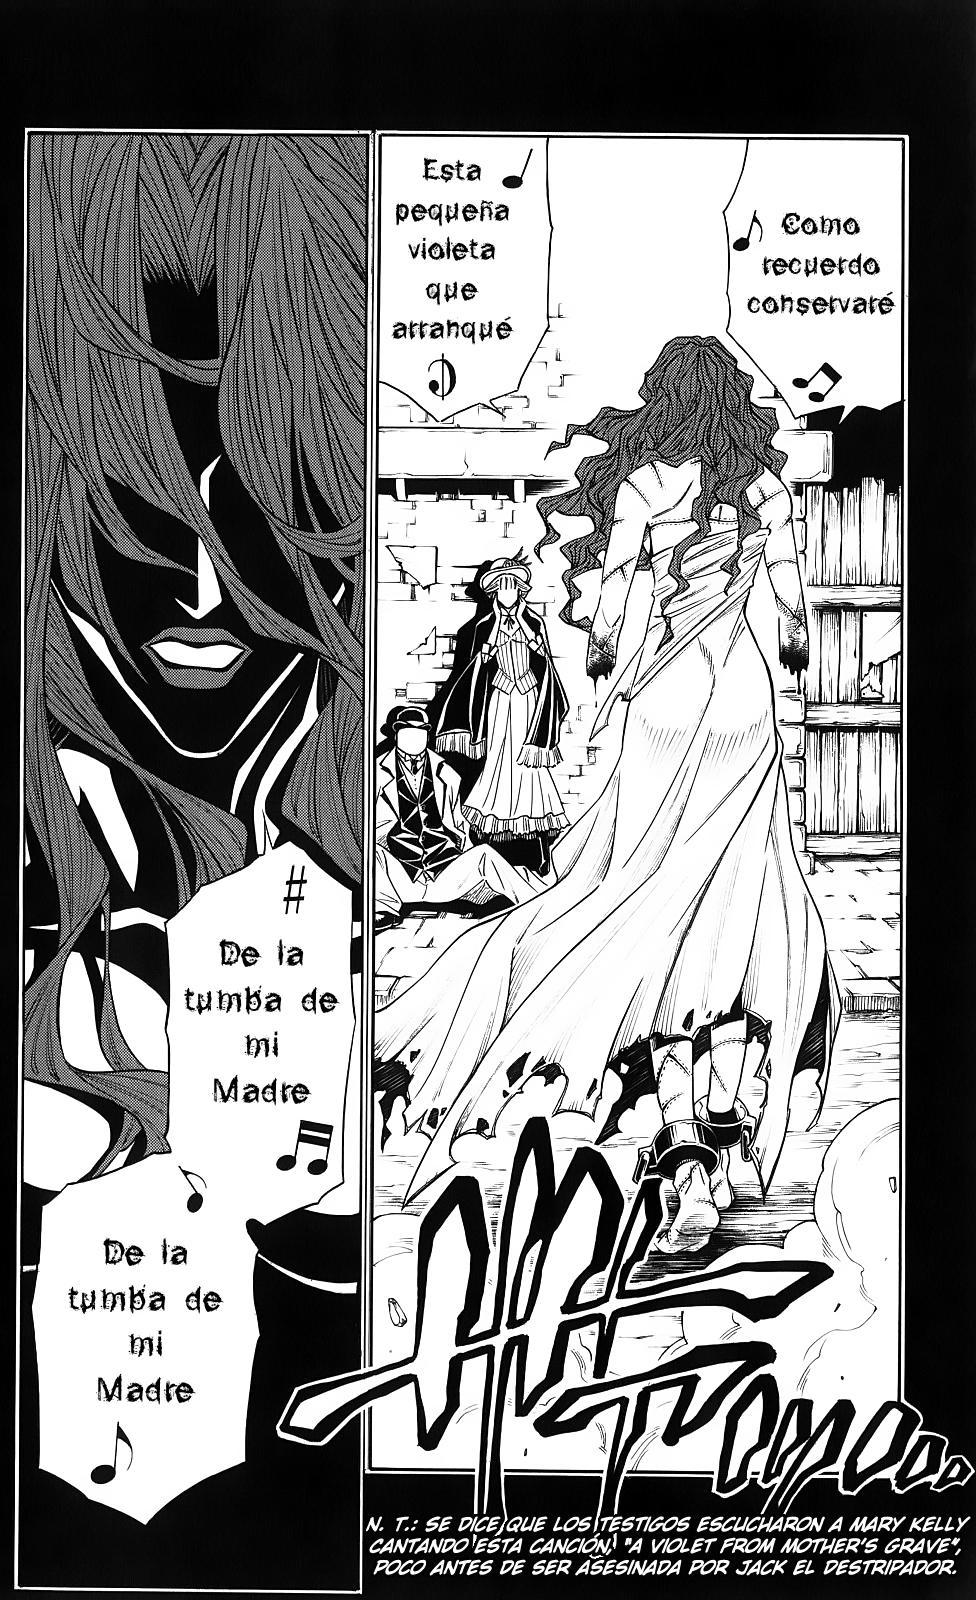 http://c5.ninemanga.com/es_manga/45/18797/447904/0d697da70a16c81e76ad0dc23026455c.jpg Page 2